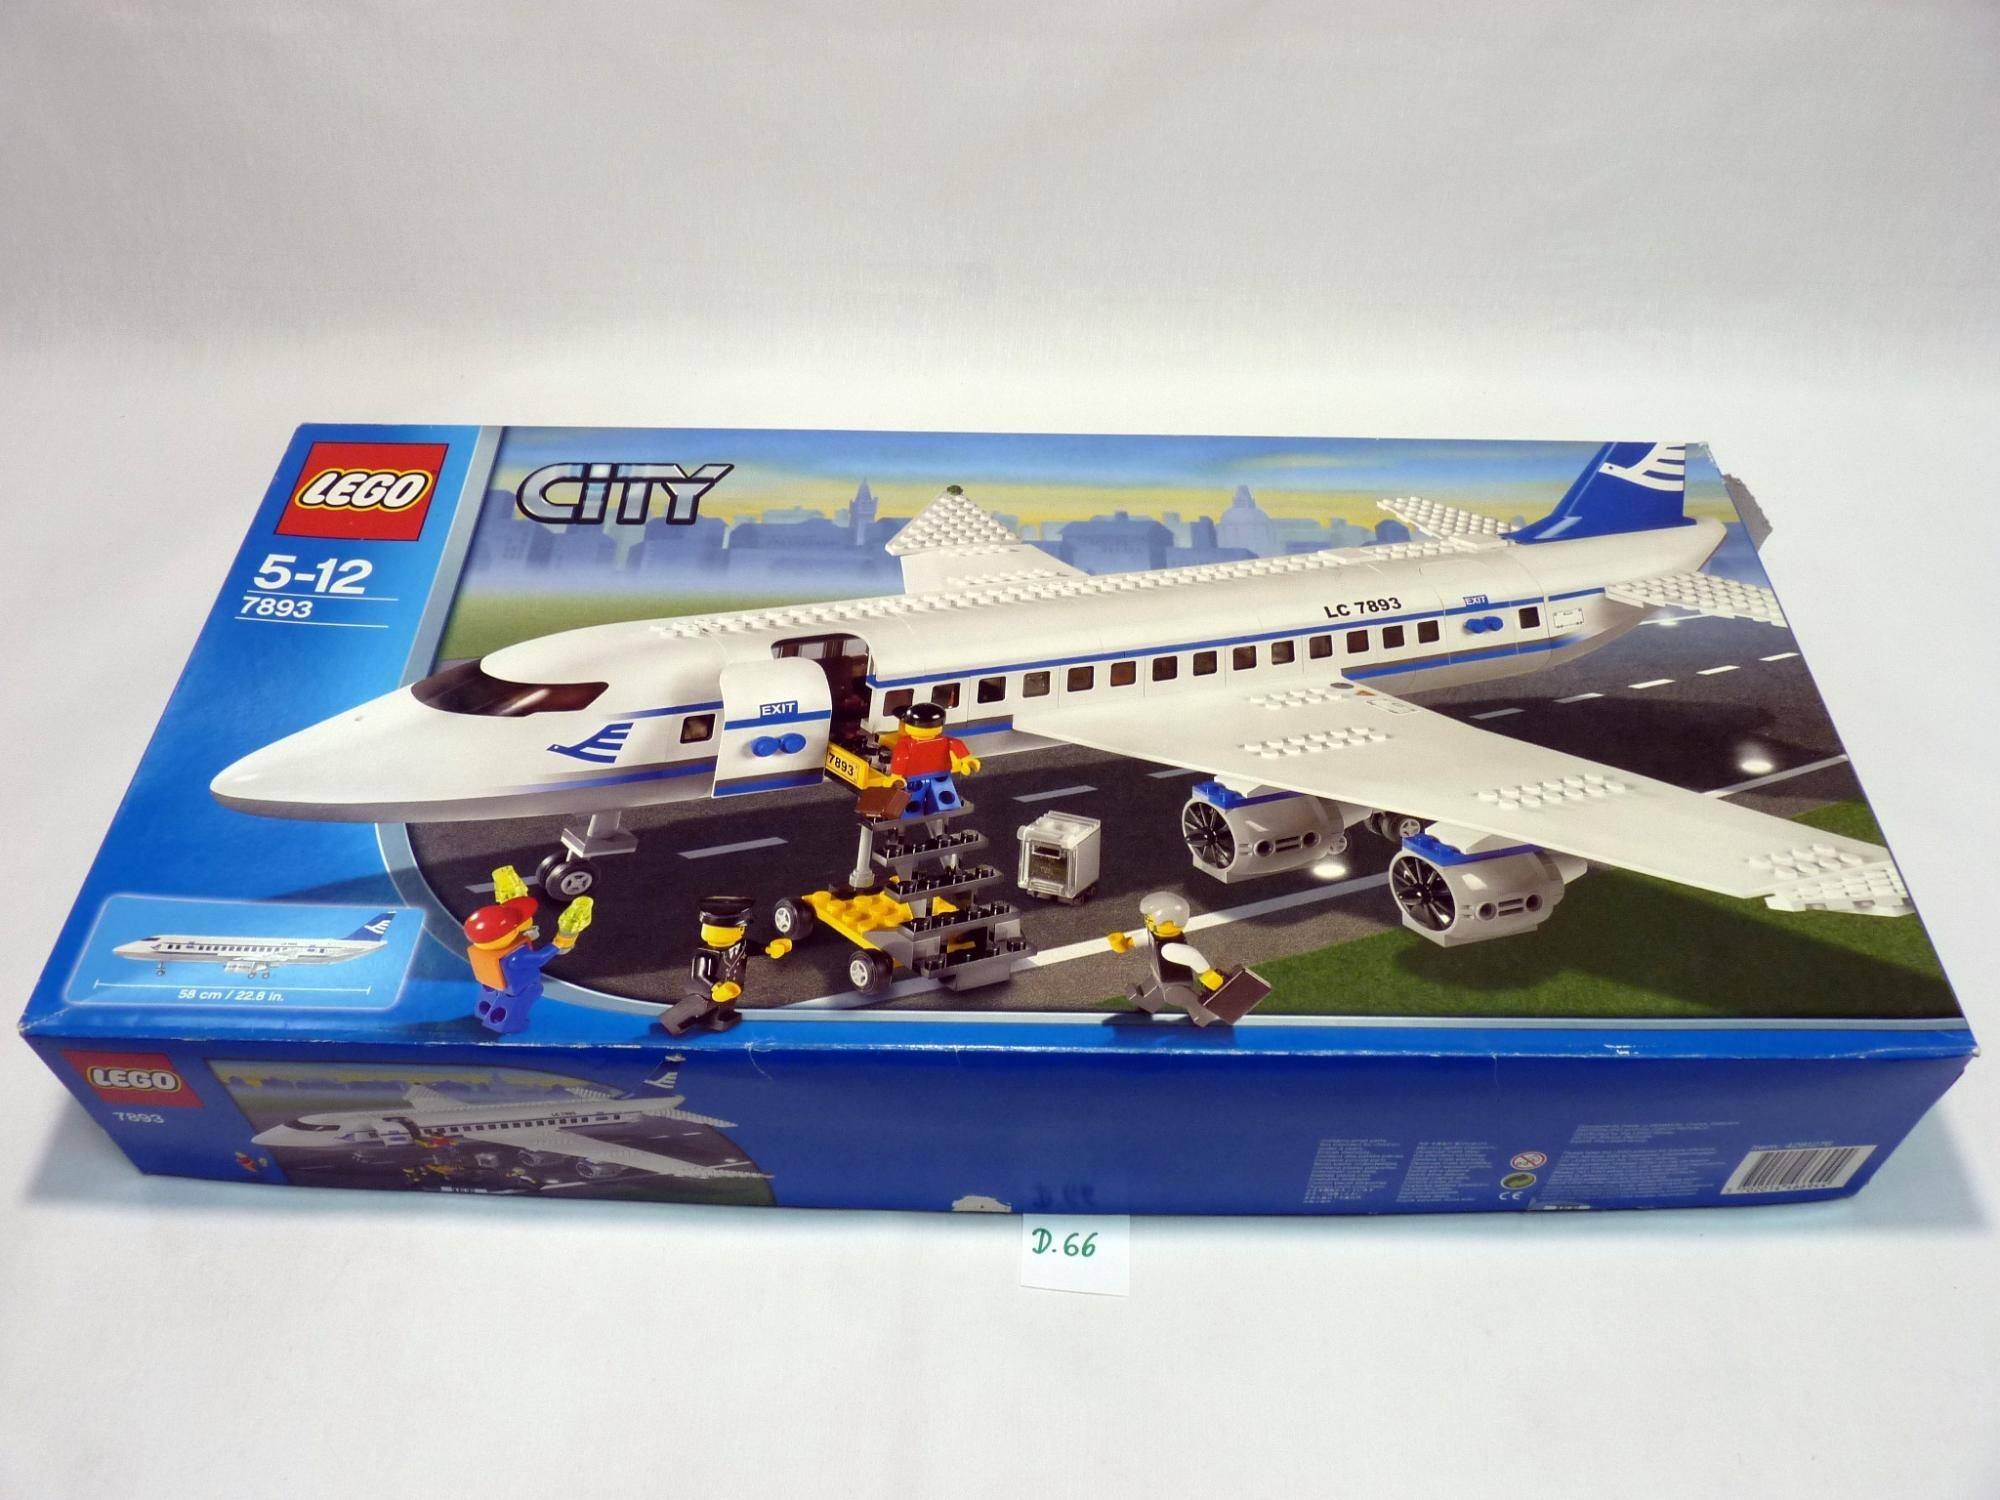 Lego City DobozKockafalu Csak Üres 7893 8nwOvm0yNP